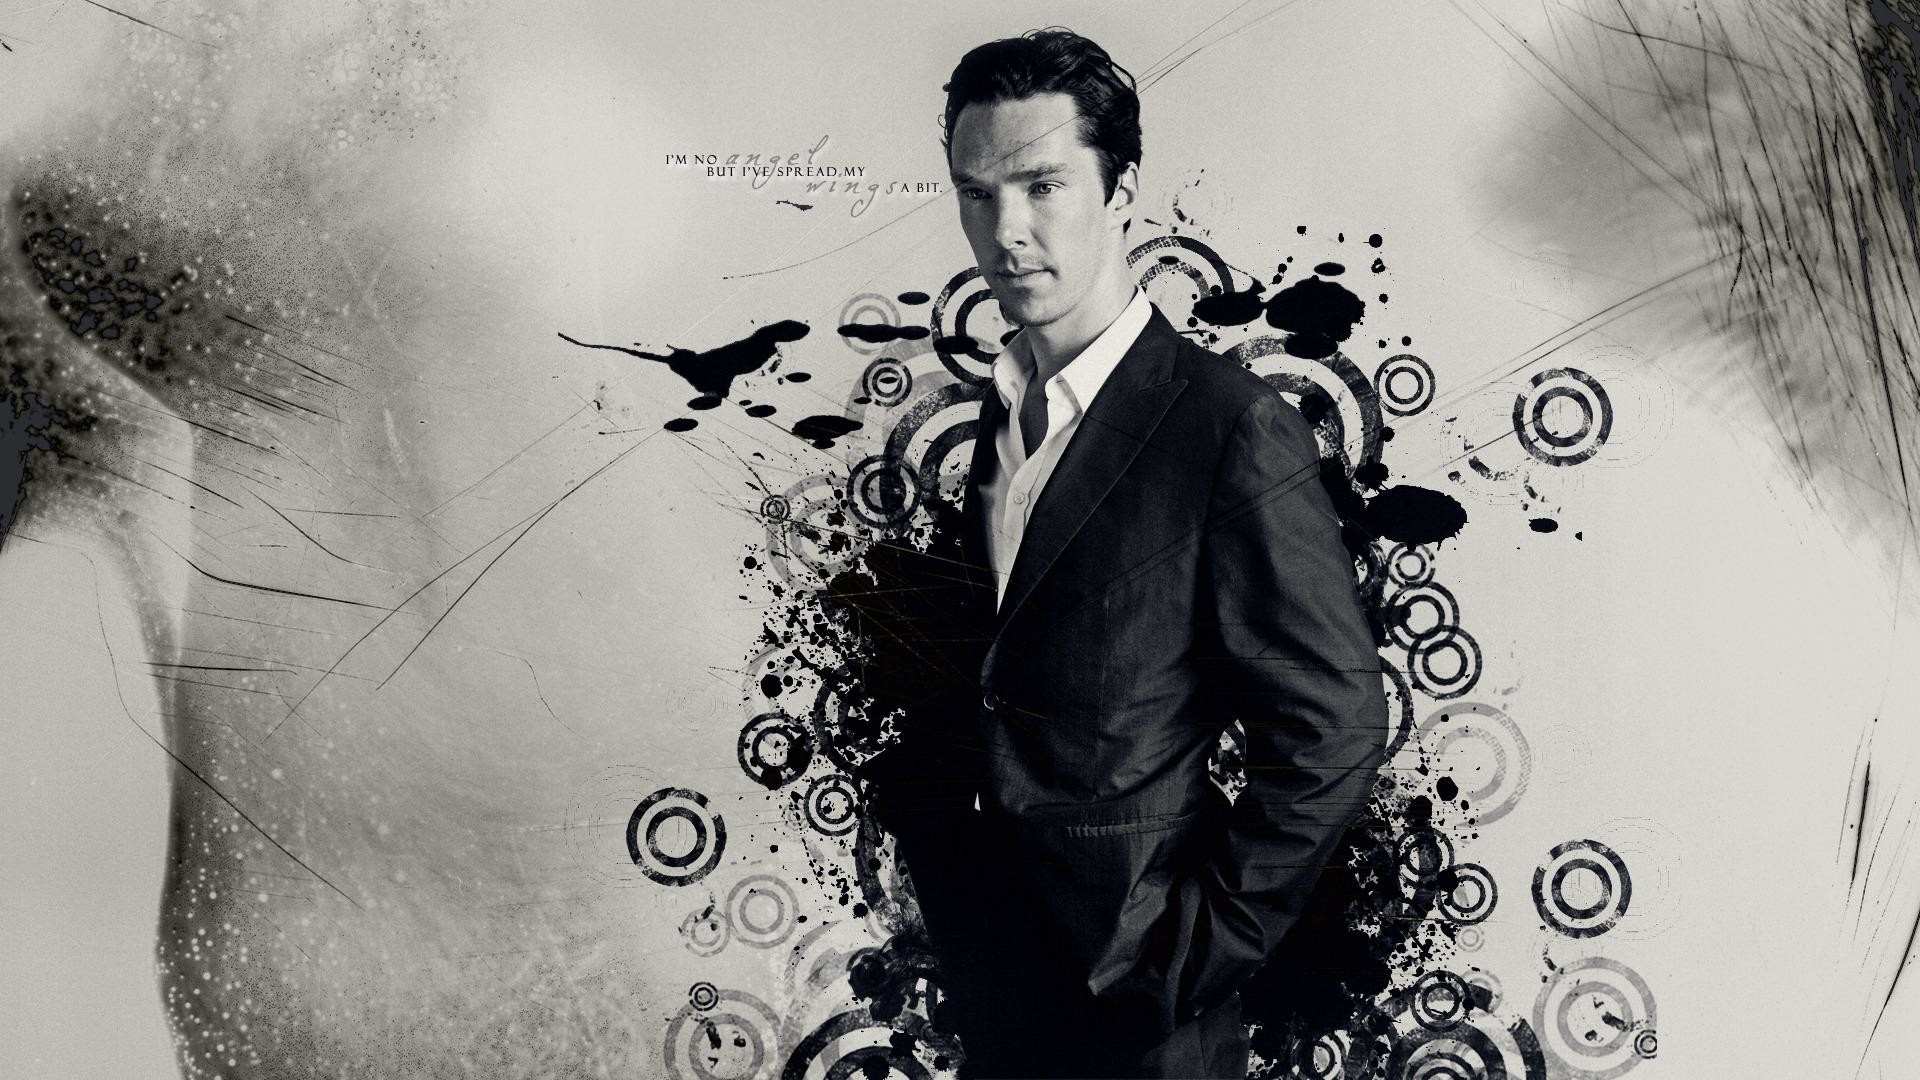 Benedict Cumberbatch Wallpaper Hd: Benedict Cumberbatch Sherlock Wallpaper (82+ Images